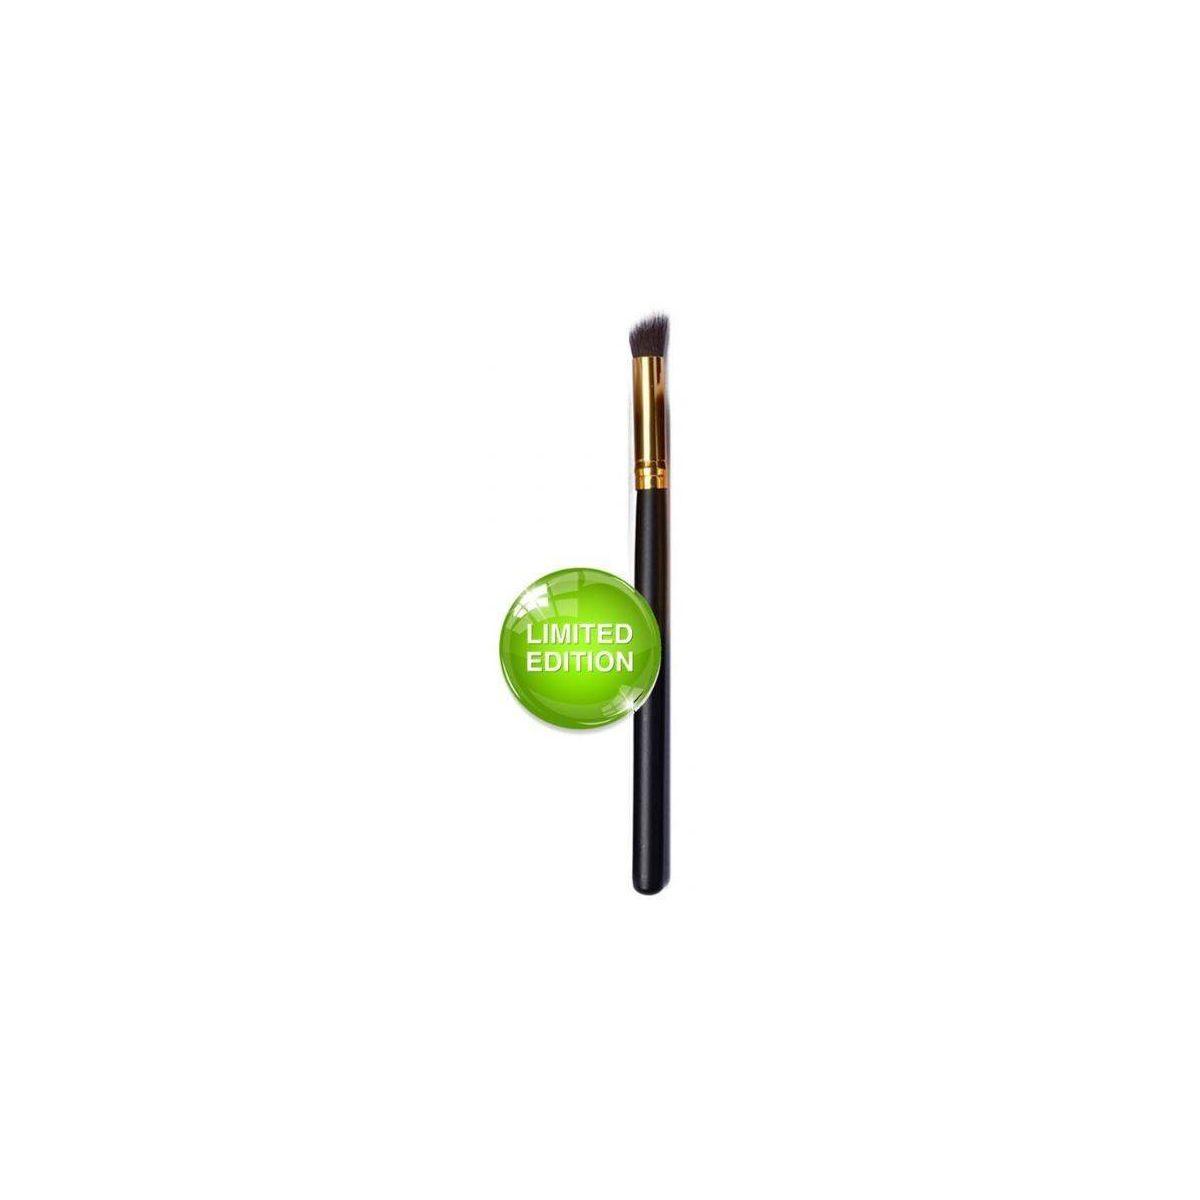 Small Makeup Brush Black